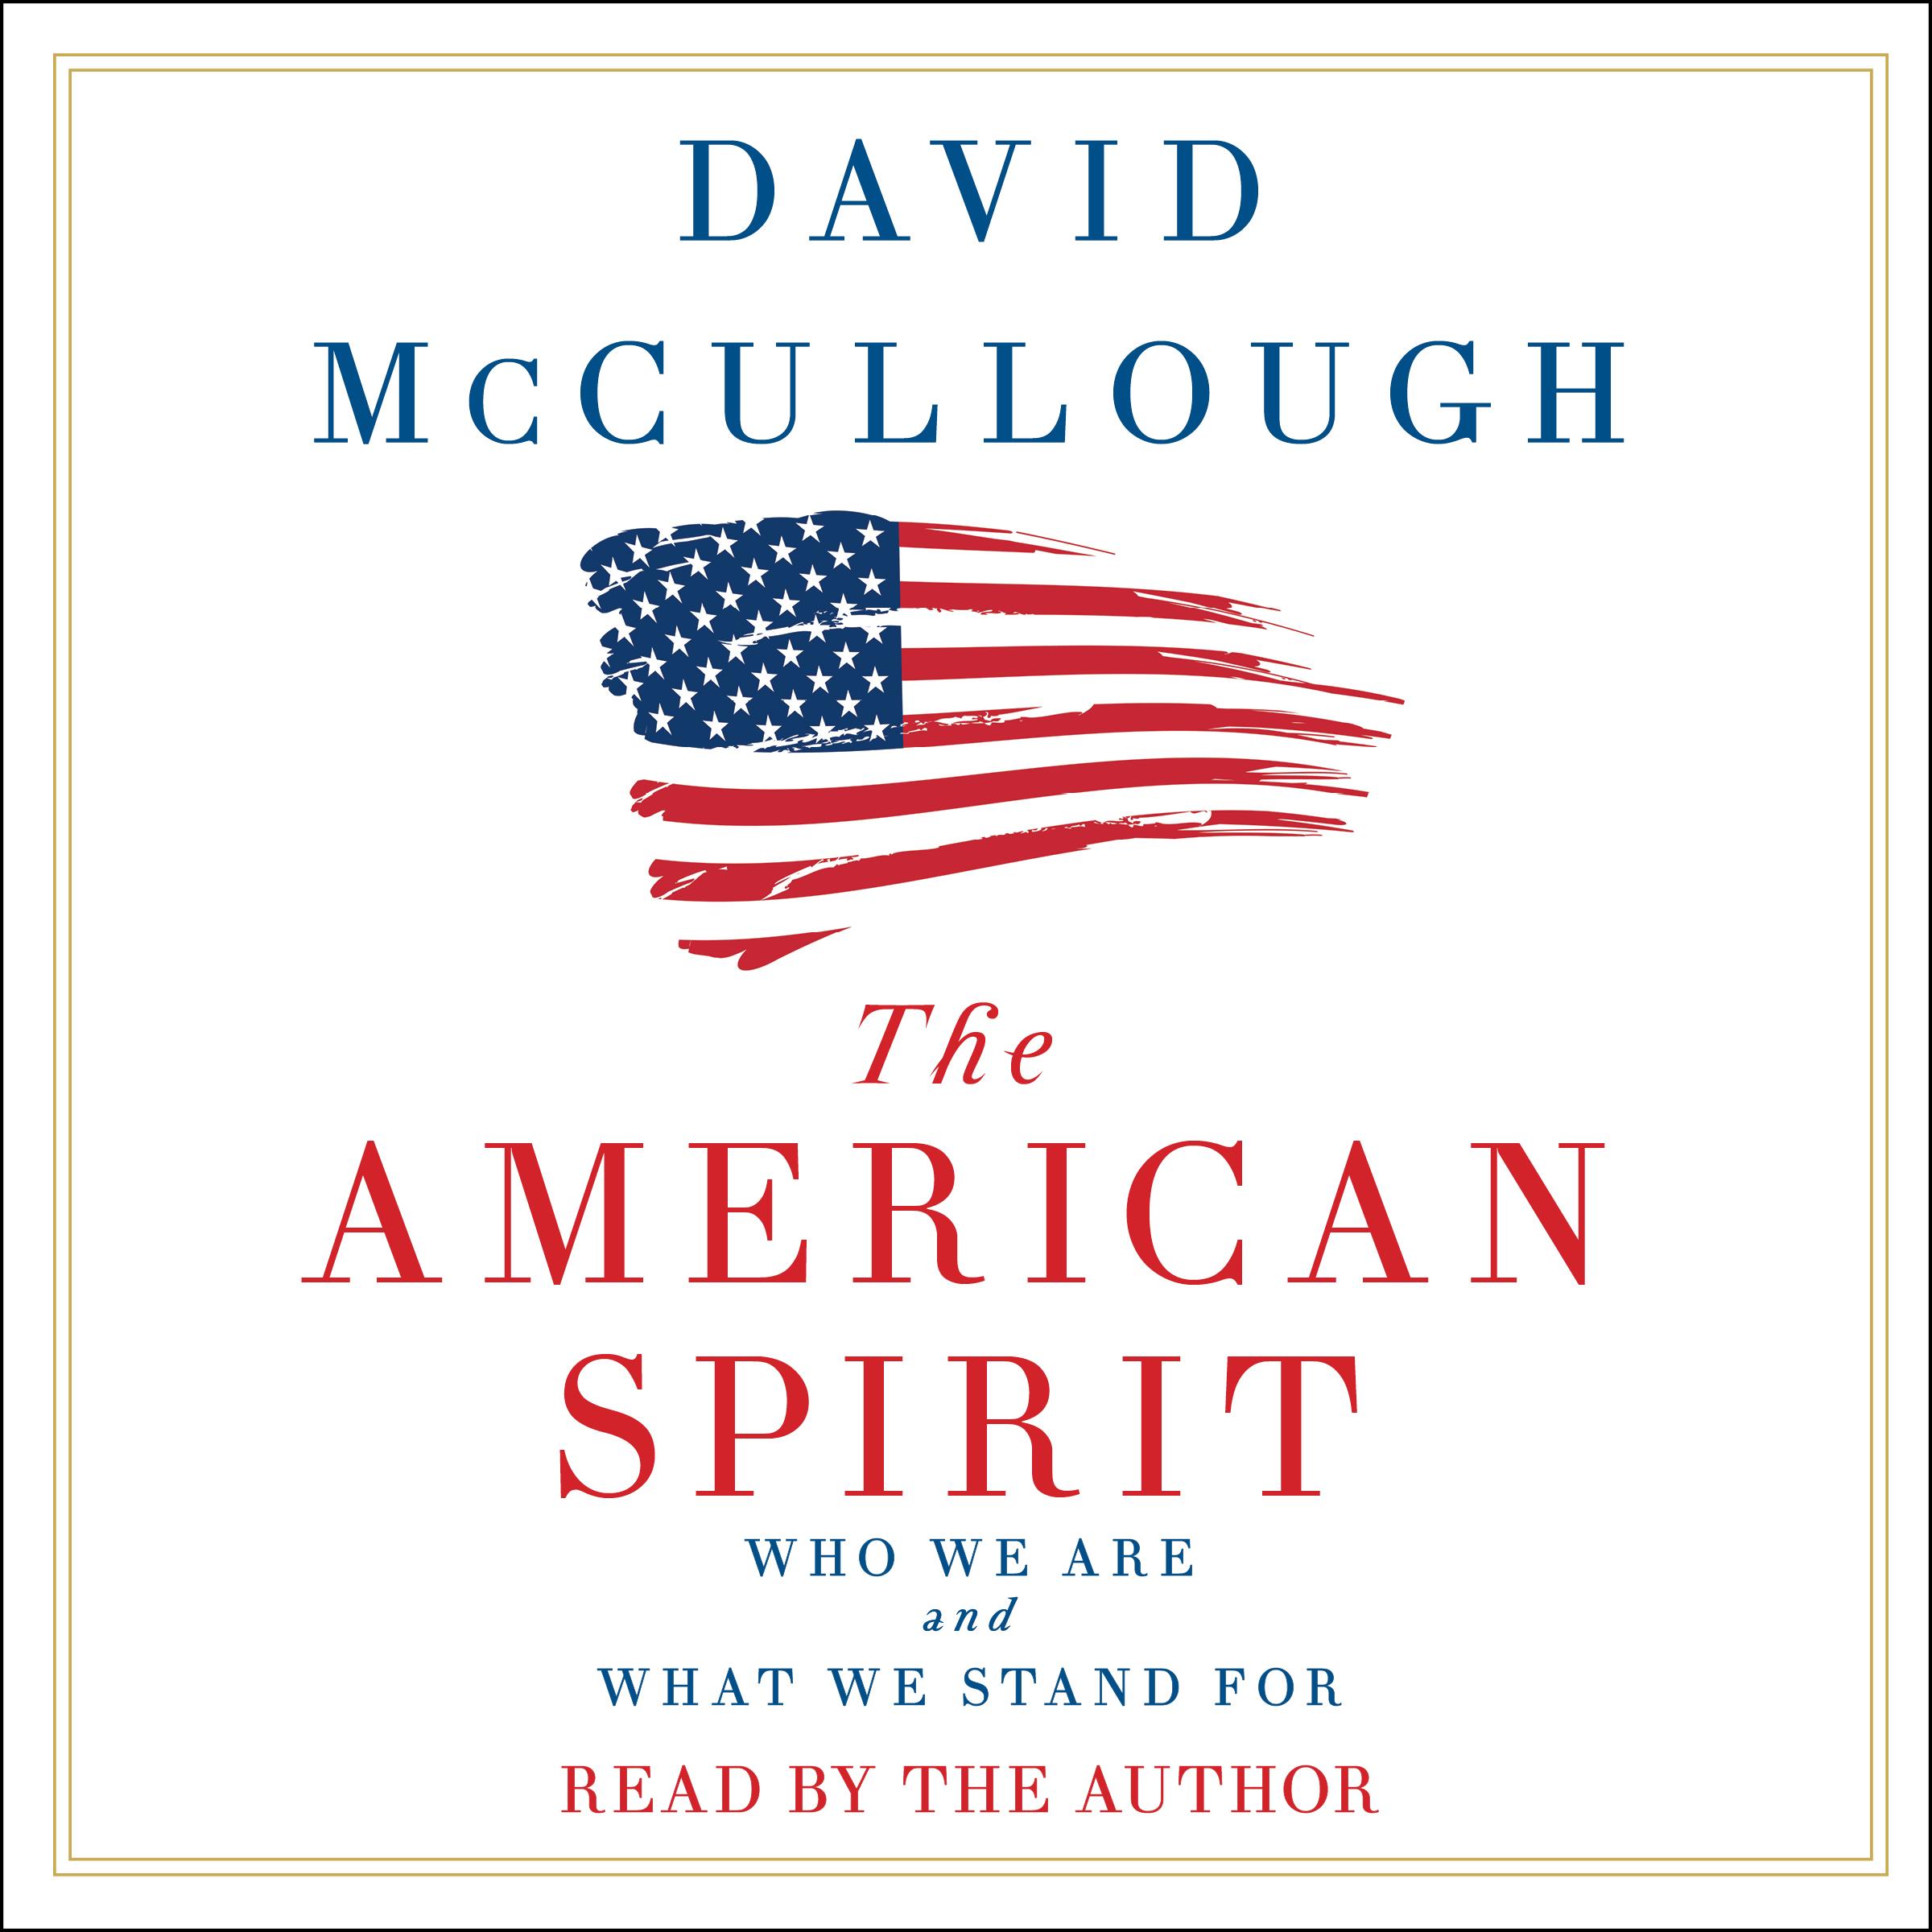 The american spirit 9781508238713 hr